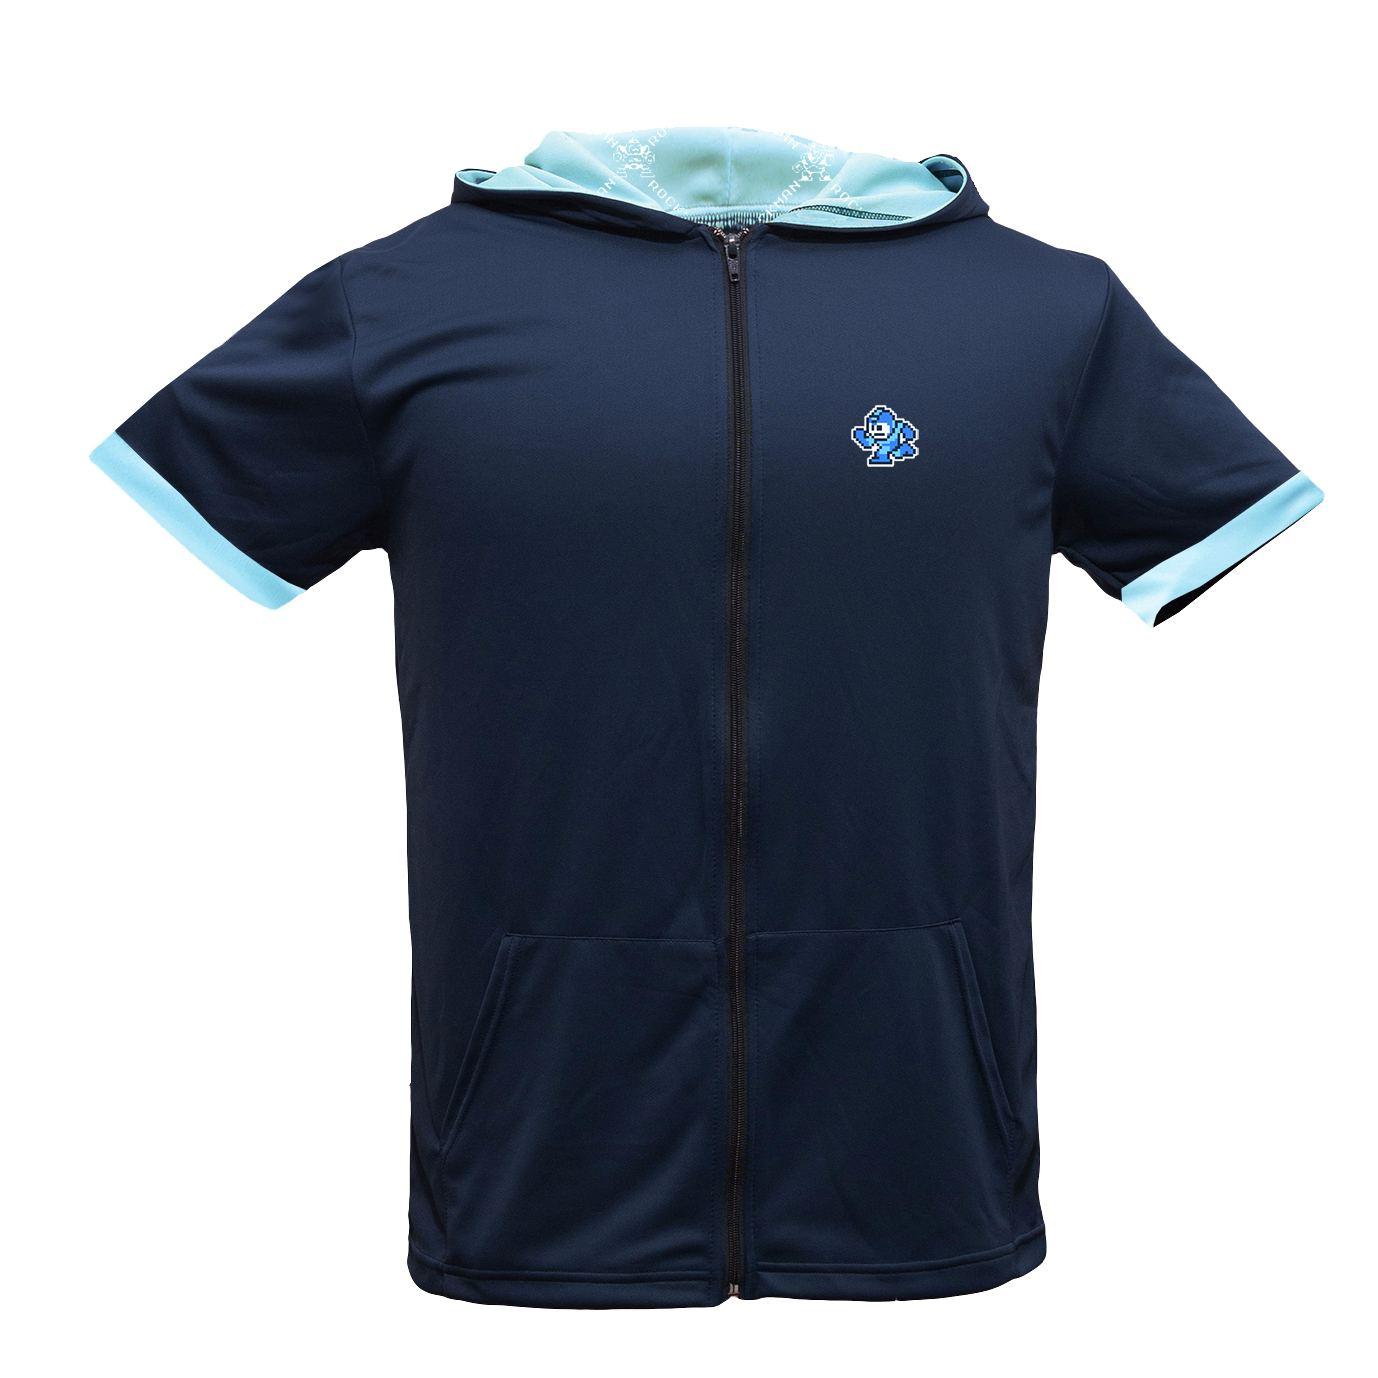 20355a02a mega-man-short-sleeve-hoodie-l-size-590107.1.jpg?ppq4nn